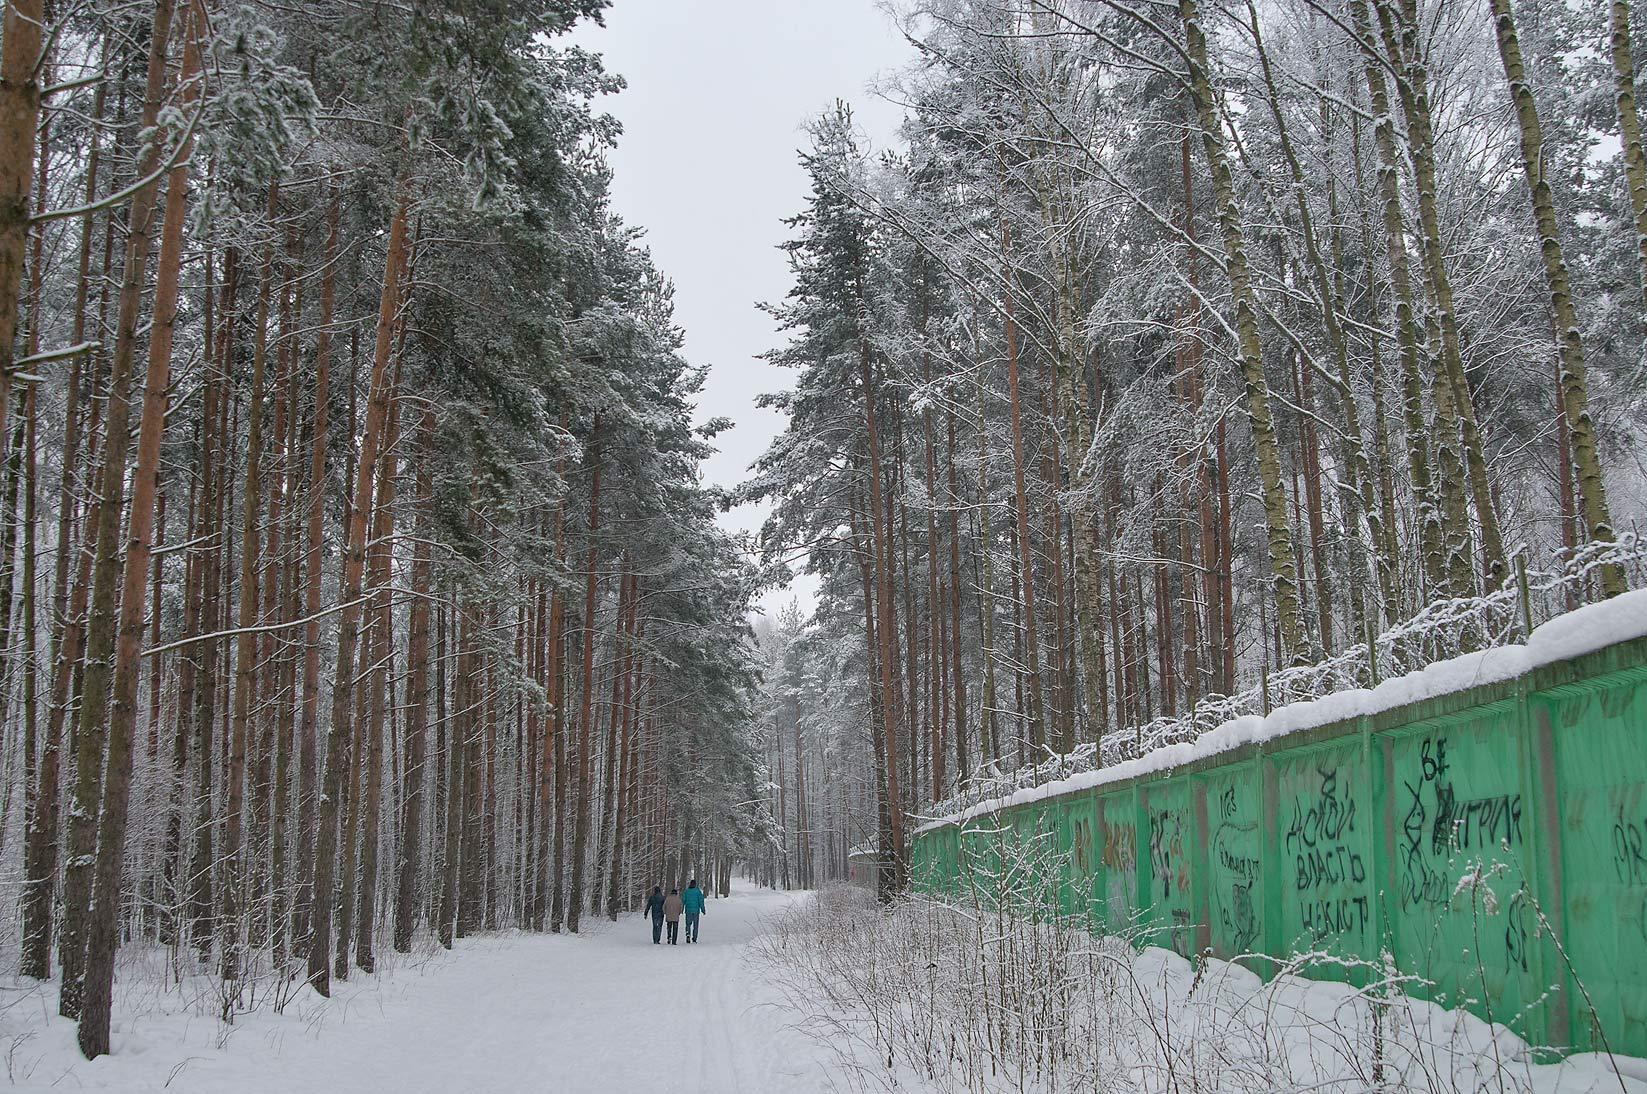 Photo 1148 04 Fence Of Shooting Range In Sosnovka Park